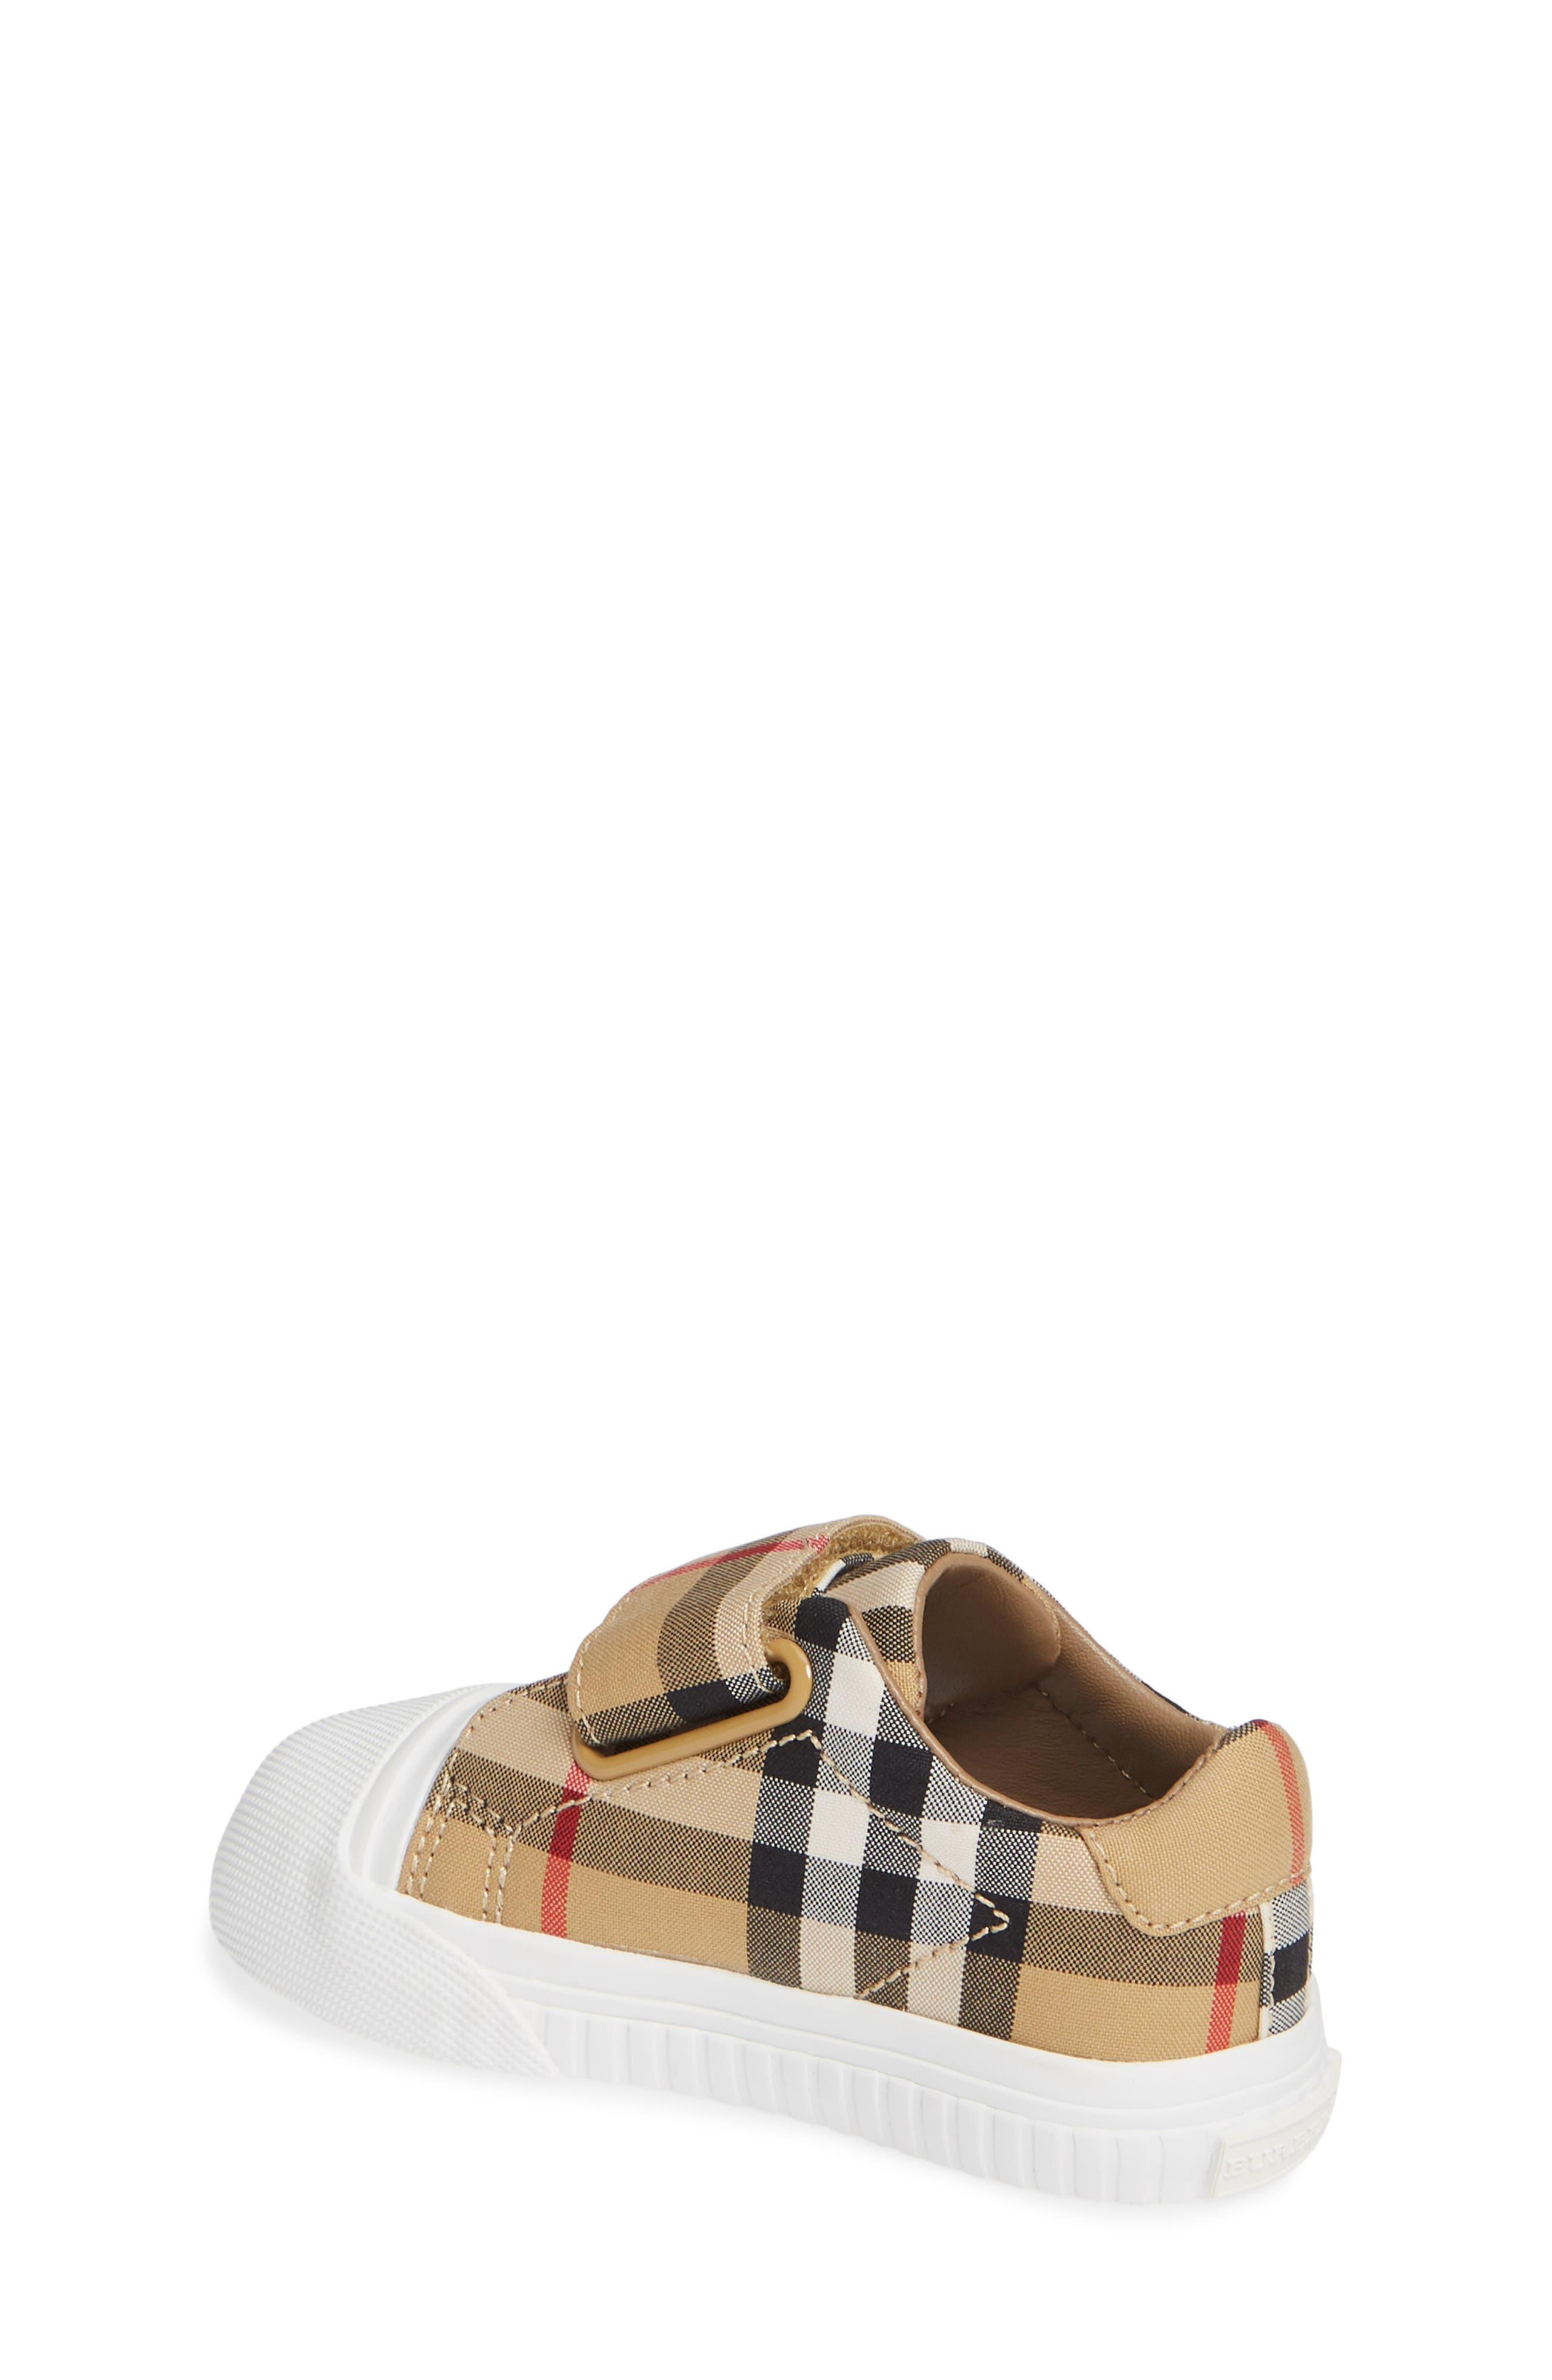 Beech Check Sneaker,                             Alternate thumbnail 4, color,